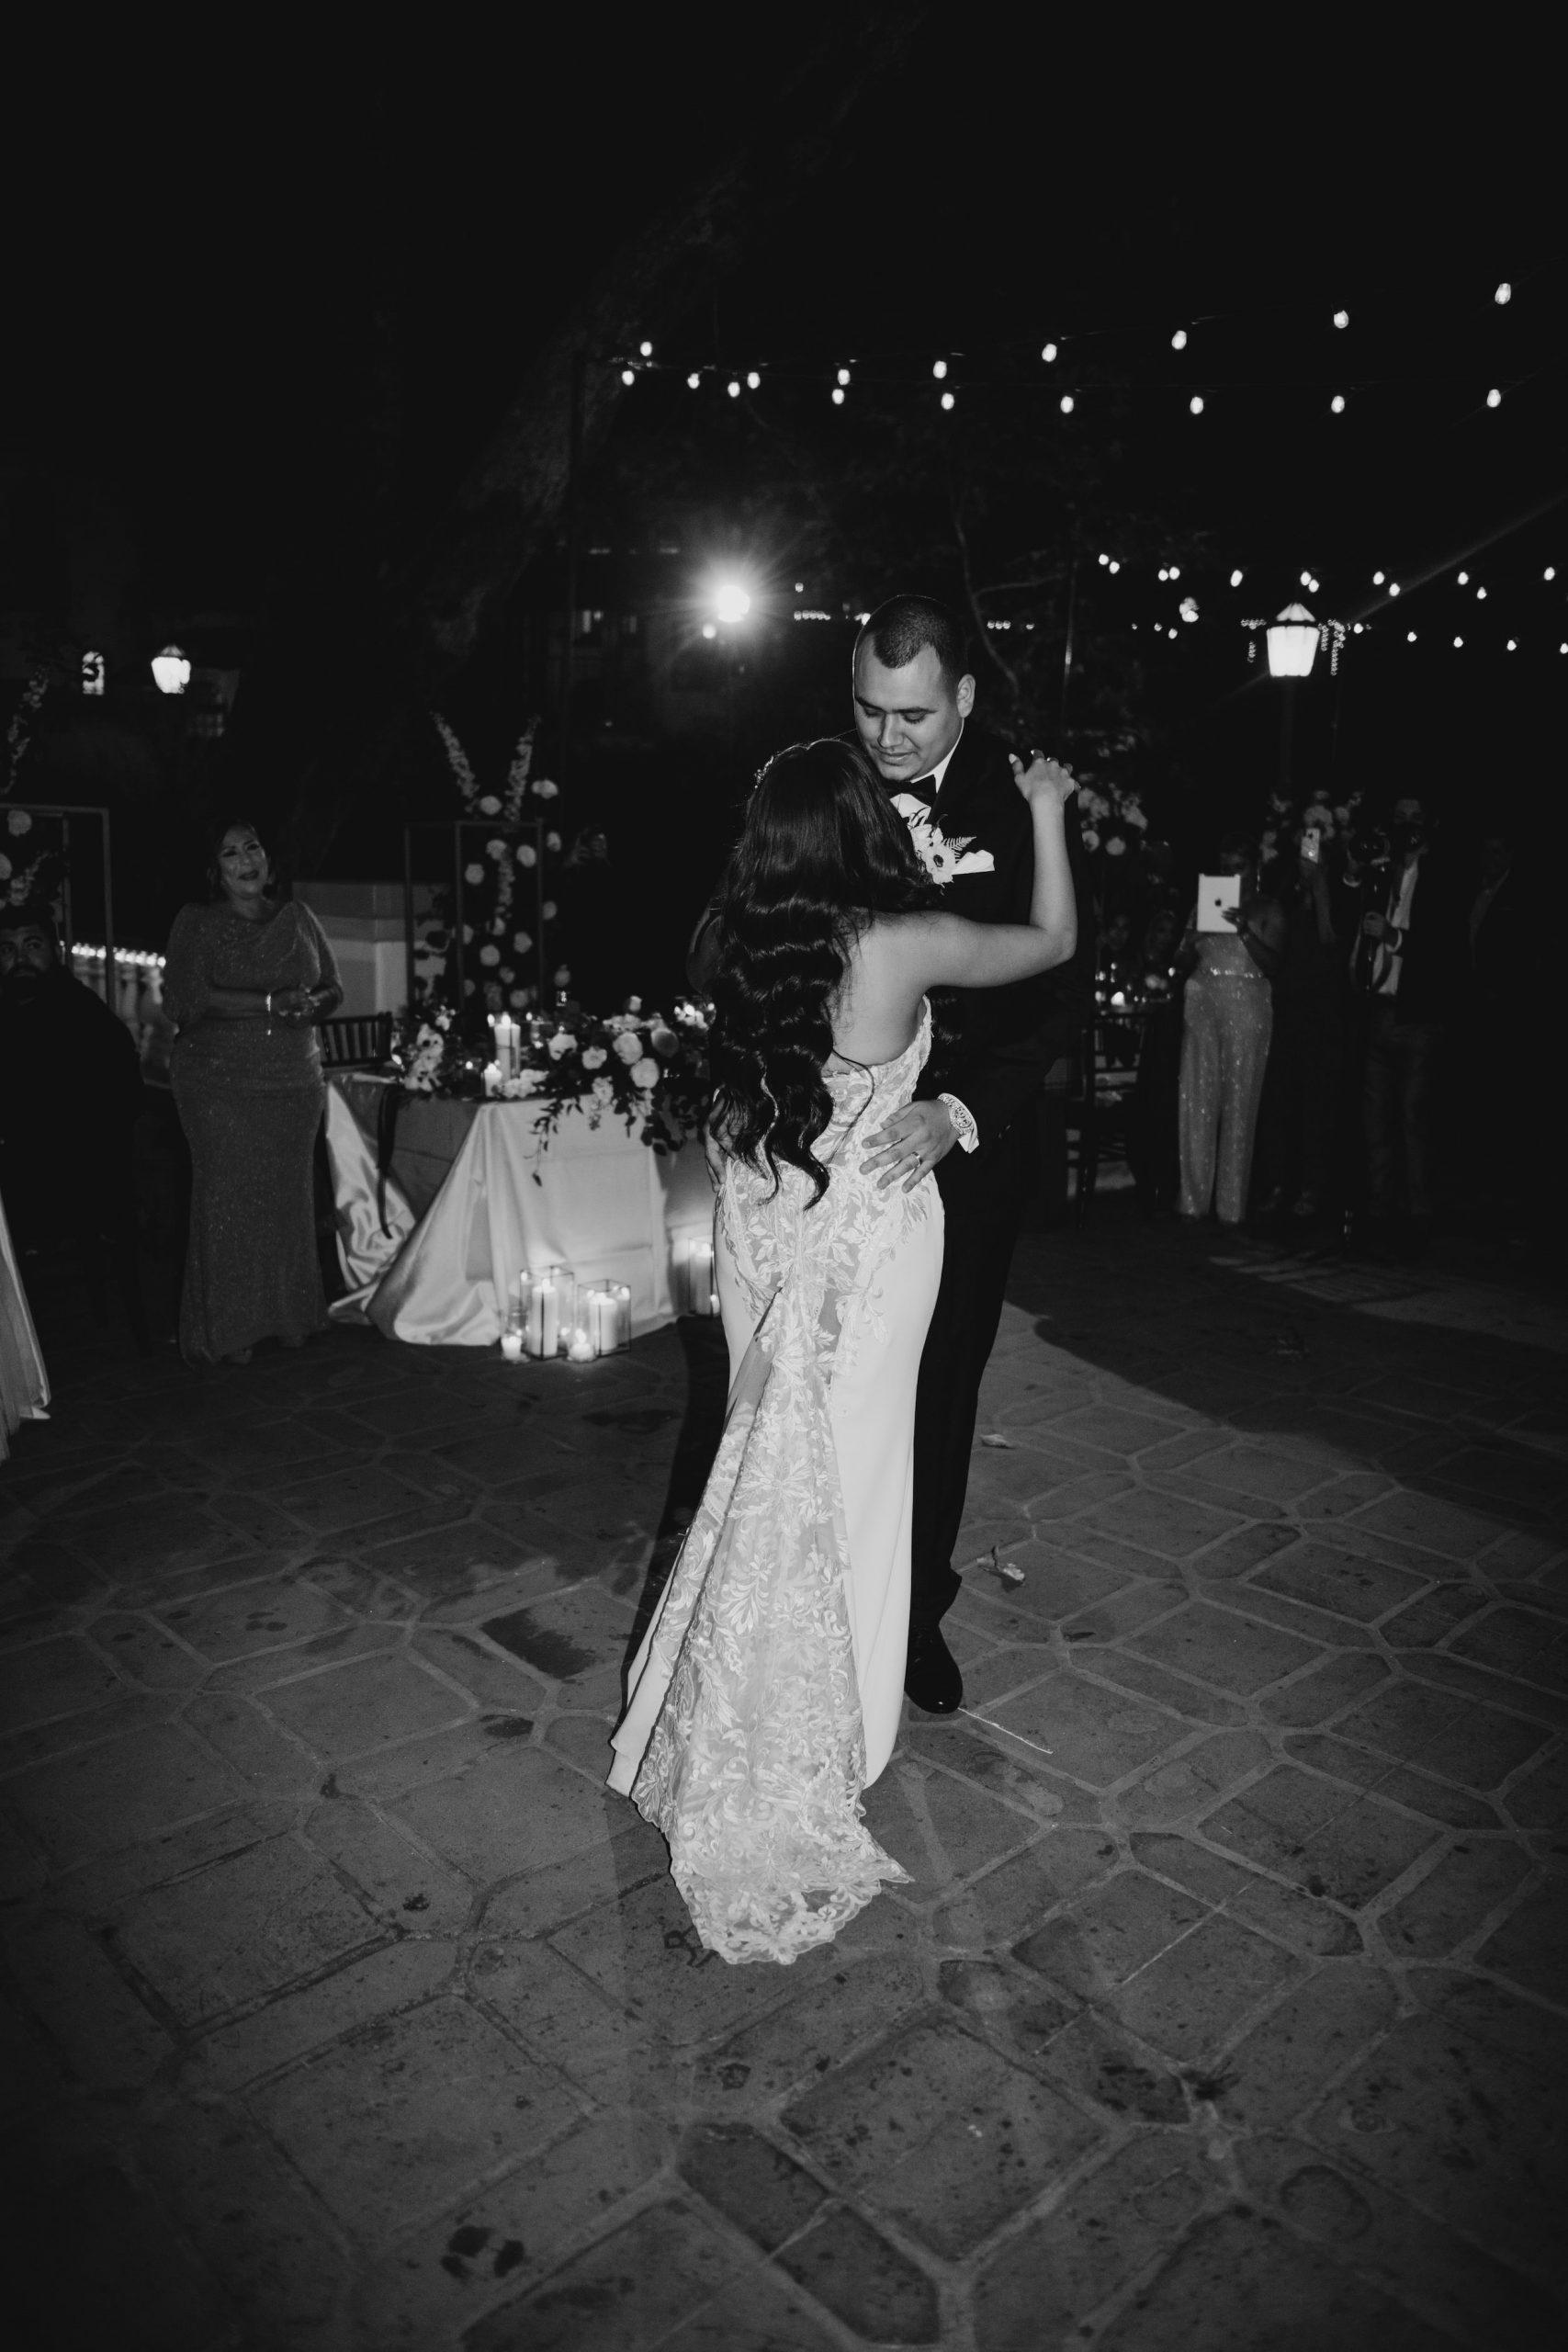 Rancho Las Lomas Wedding First Dance, image by Fatima Elreda Photo